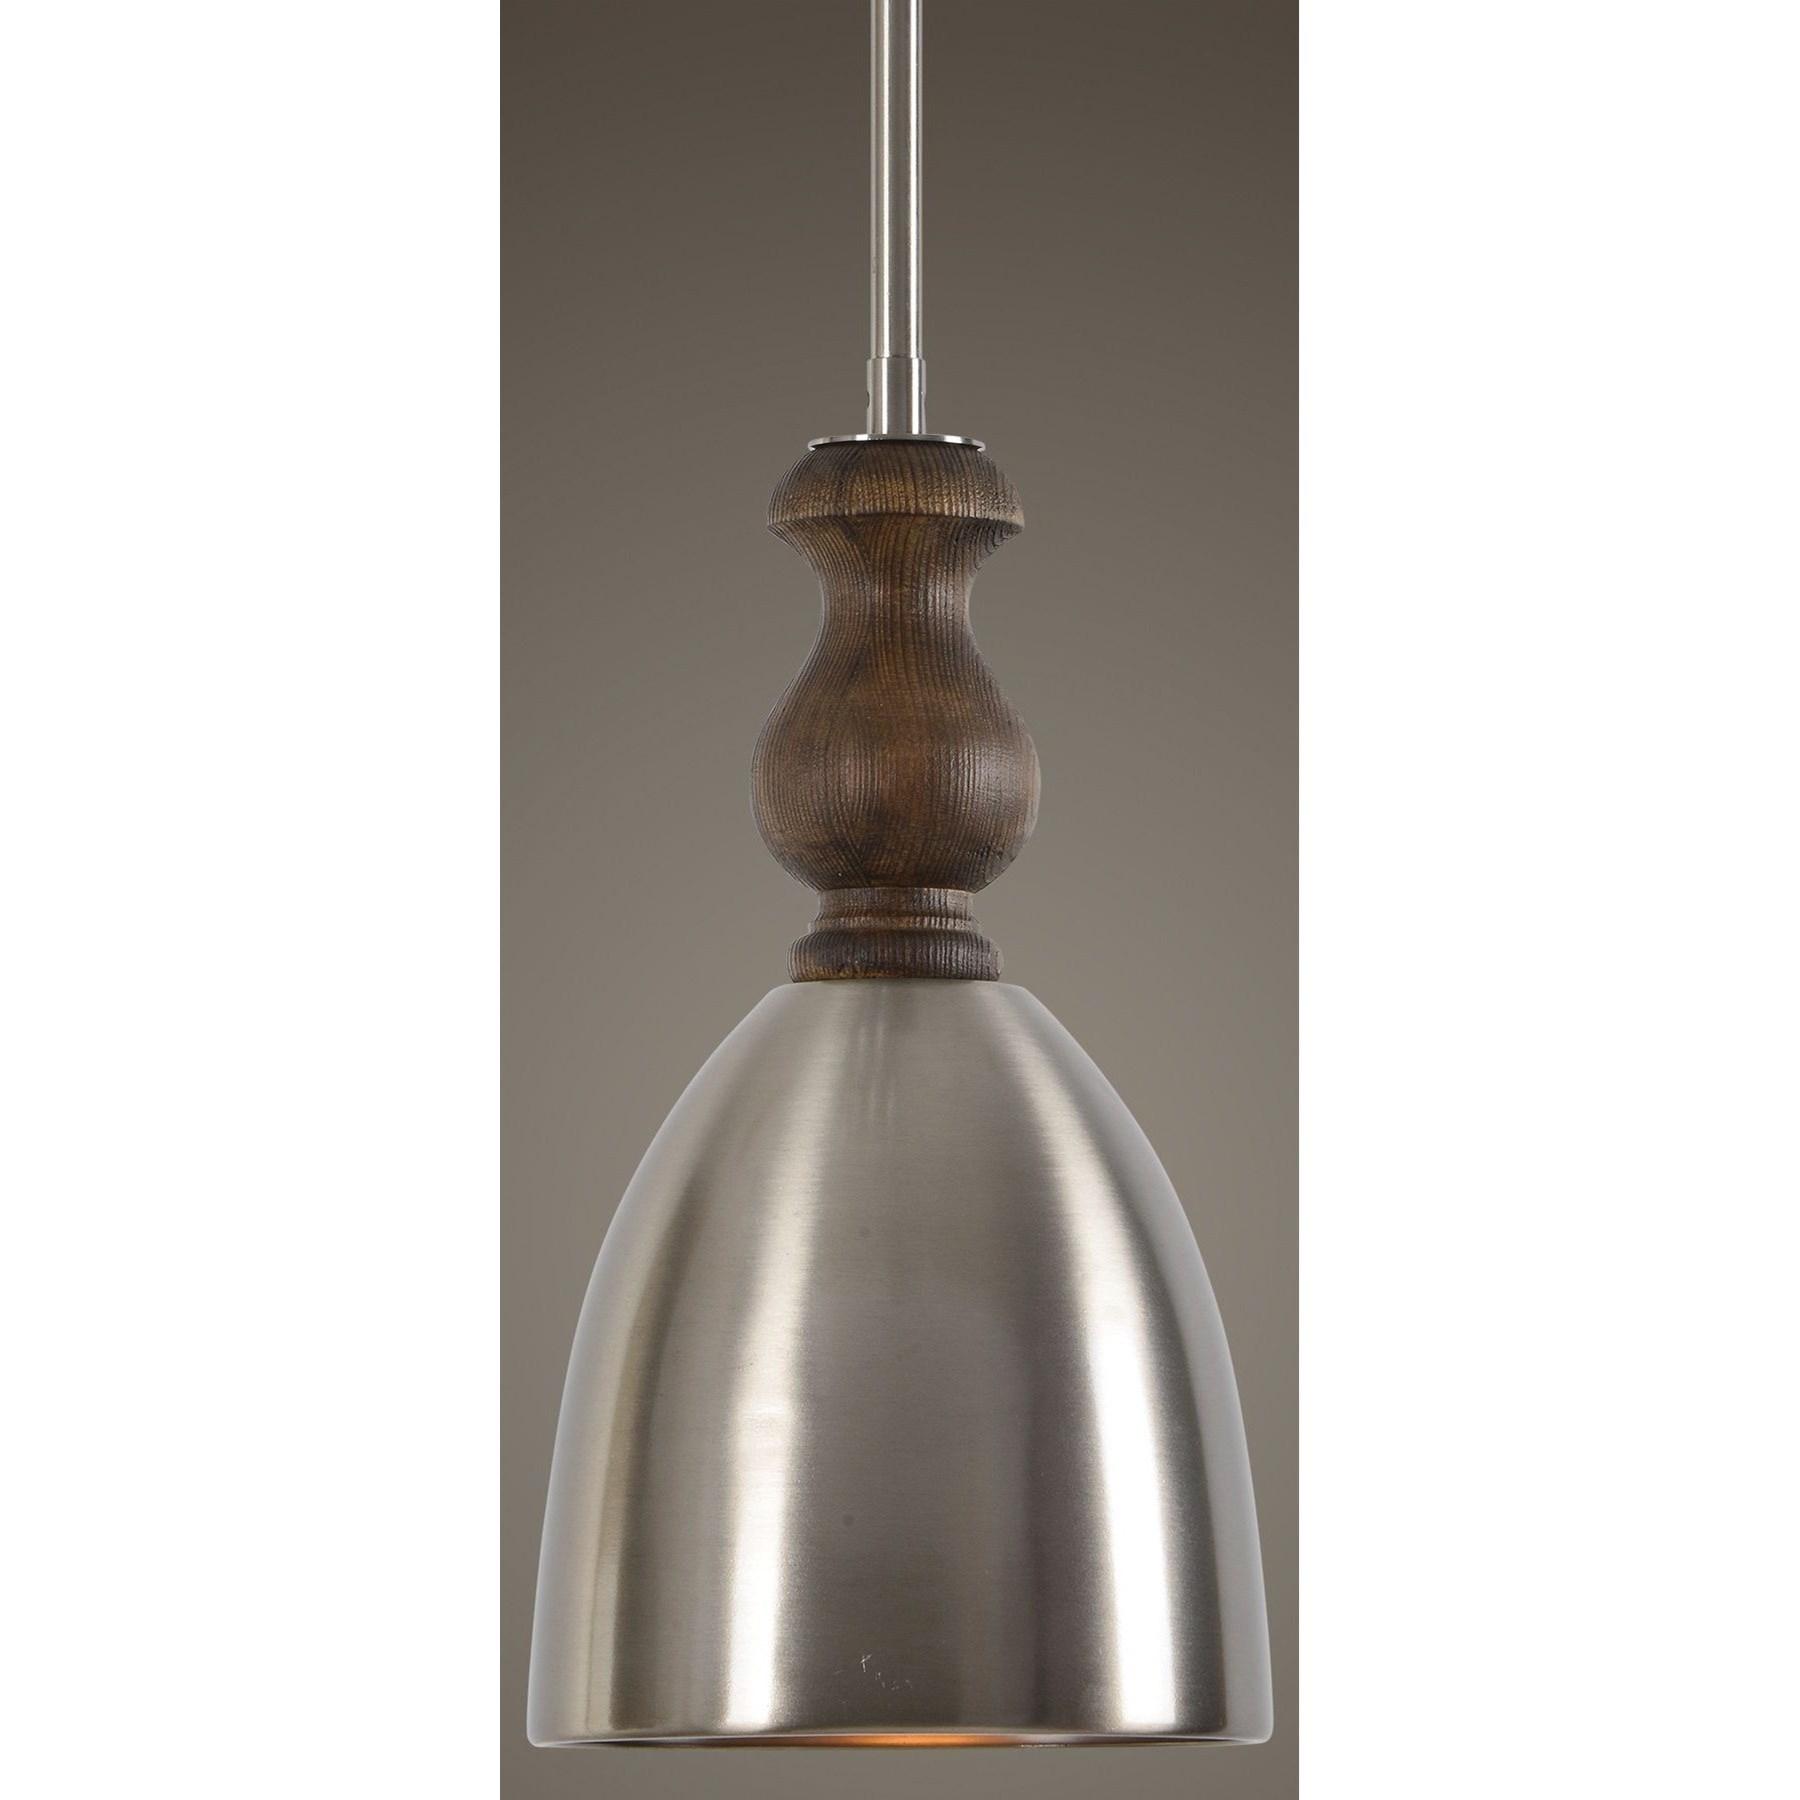 Aluminous Lighting Products : Lighting fixtures luna light aluminum mini pendant